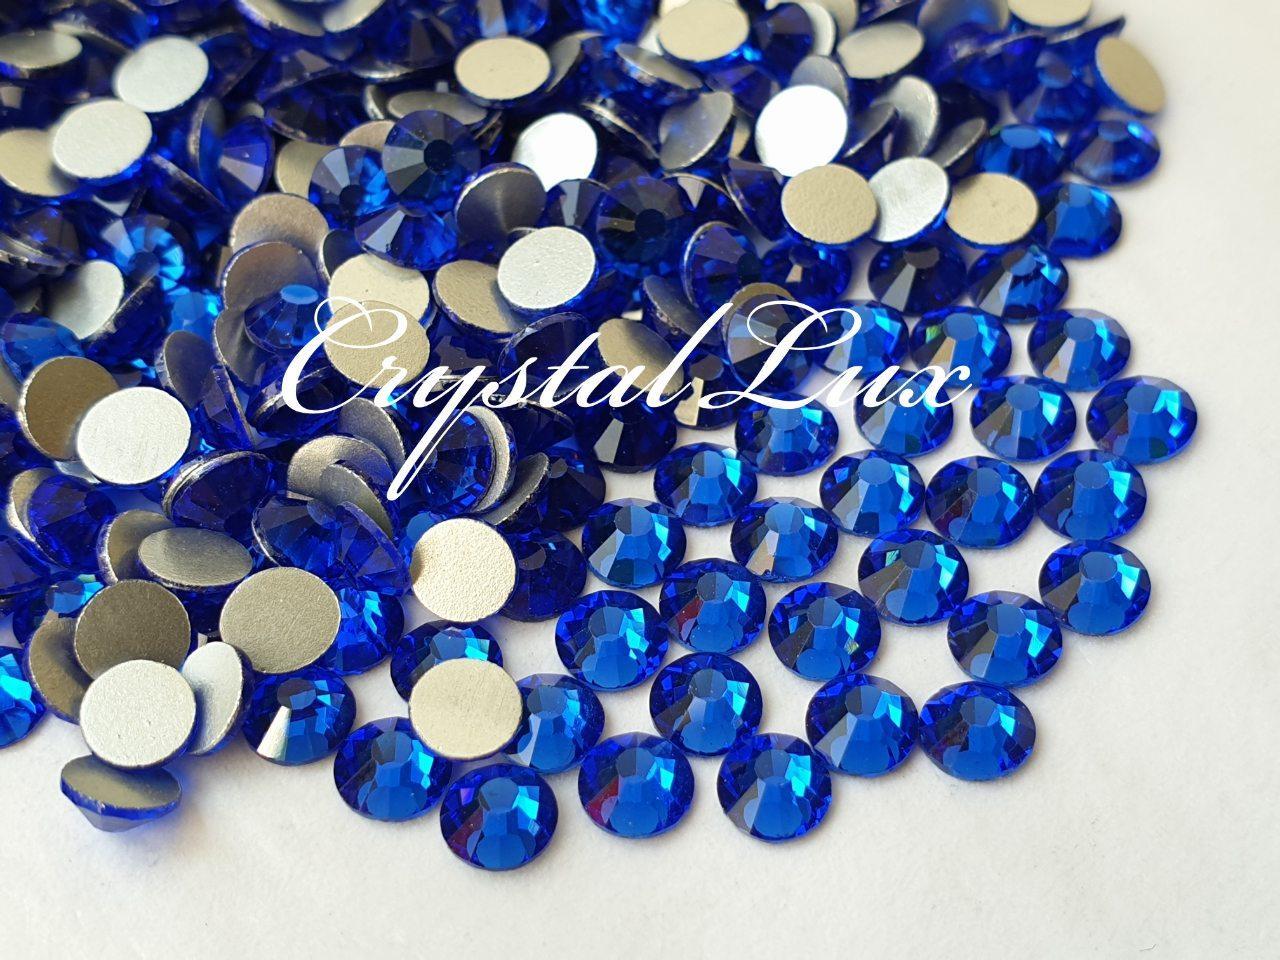 Стразы Lux ss16 Sapphire (4.0mm) 1440шт